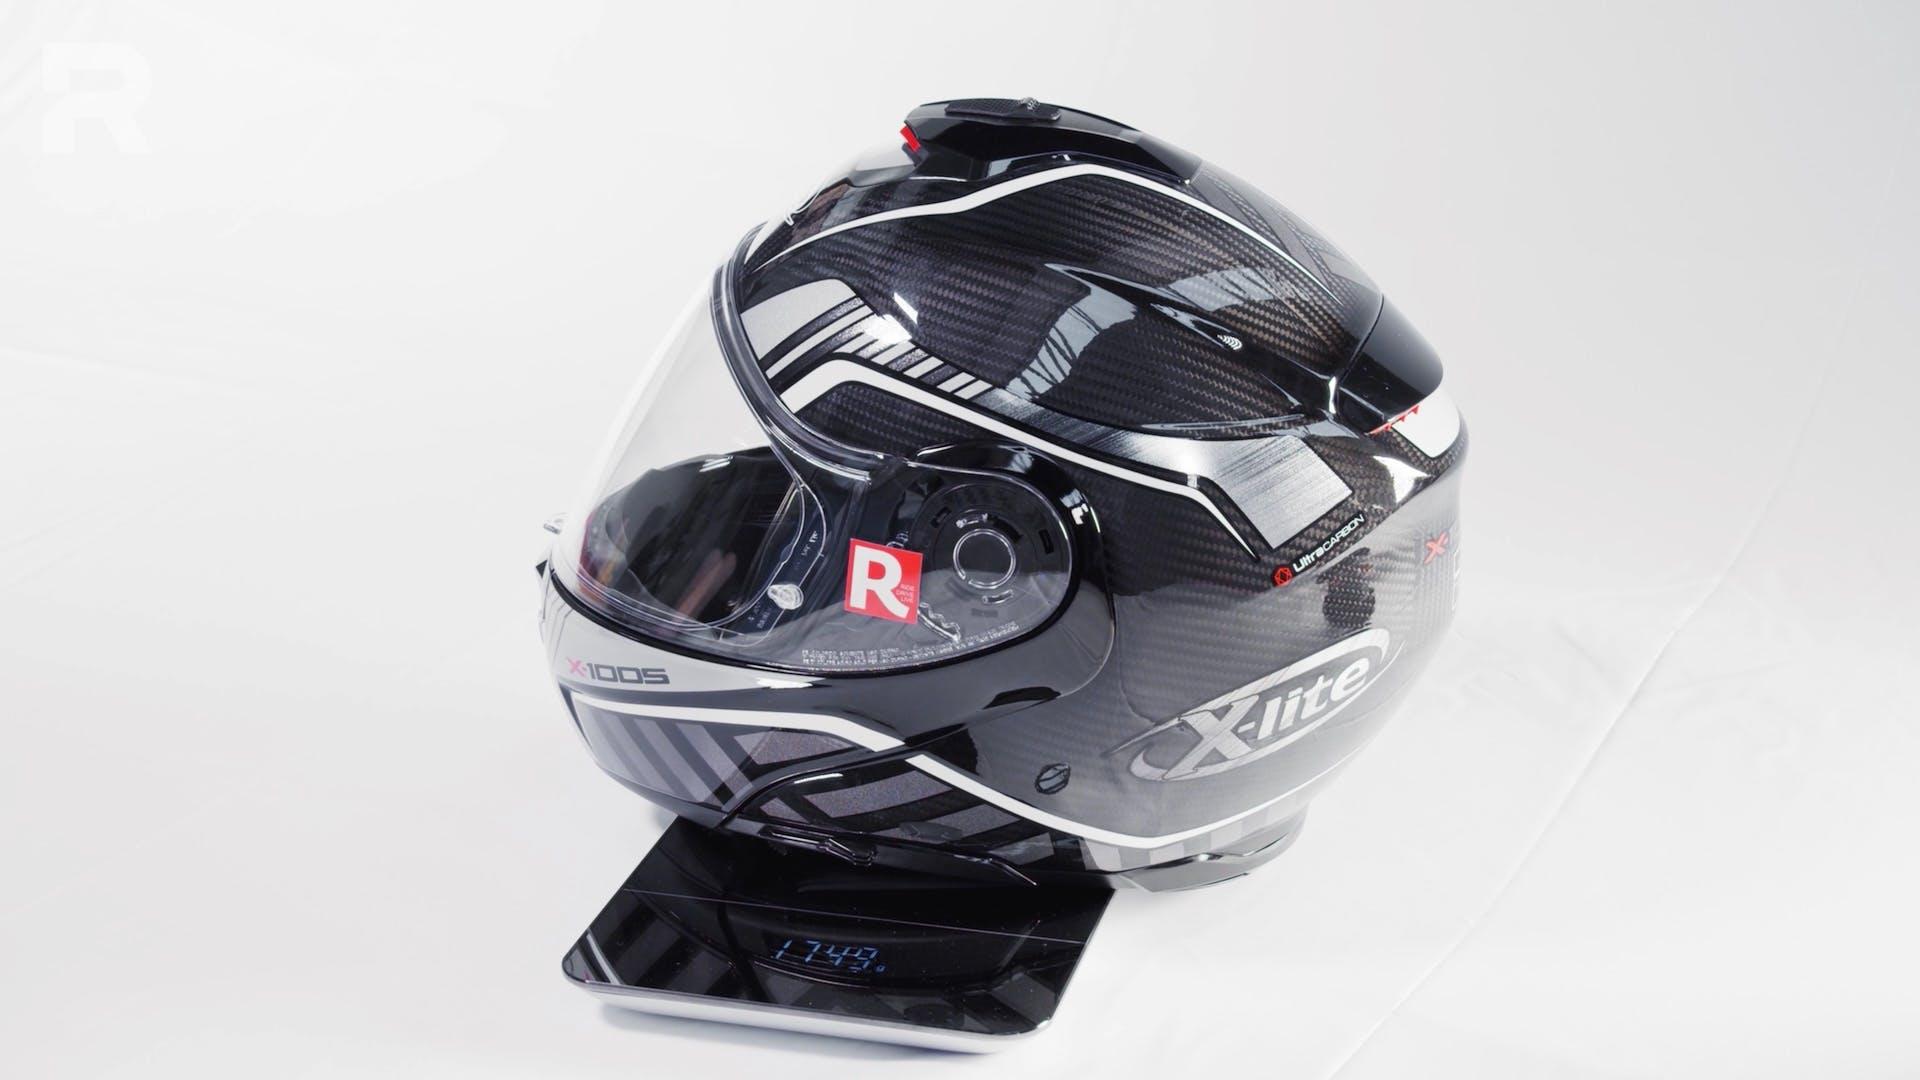 X-Lite X-1005 Ultra Carbon - peso